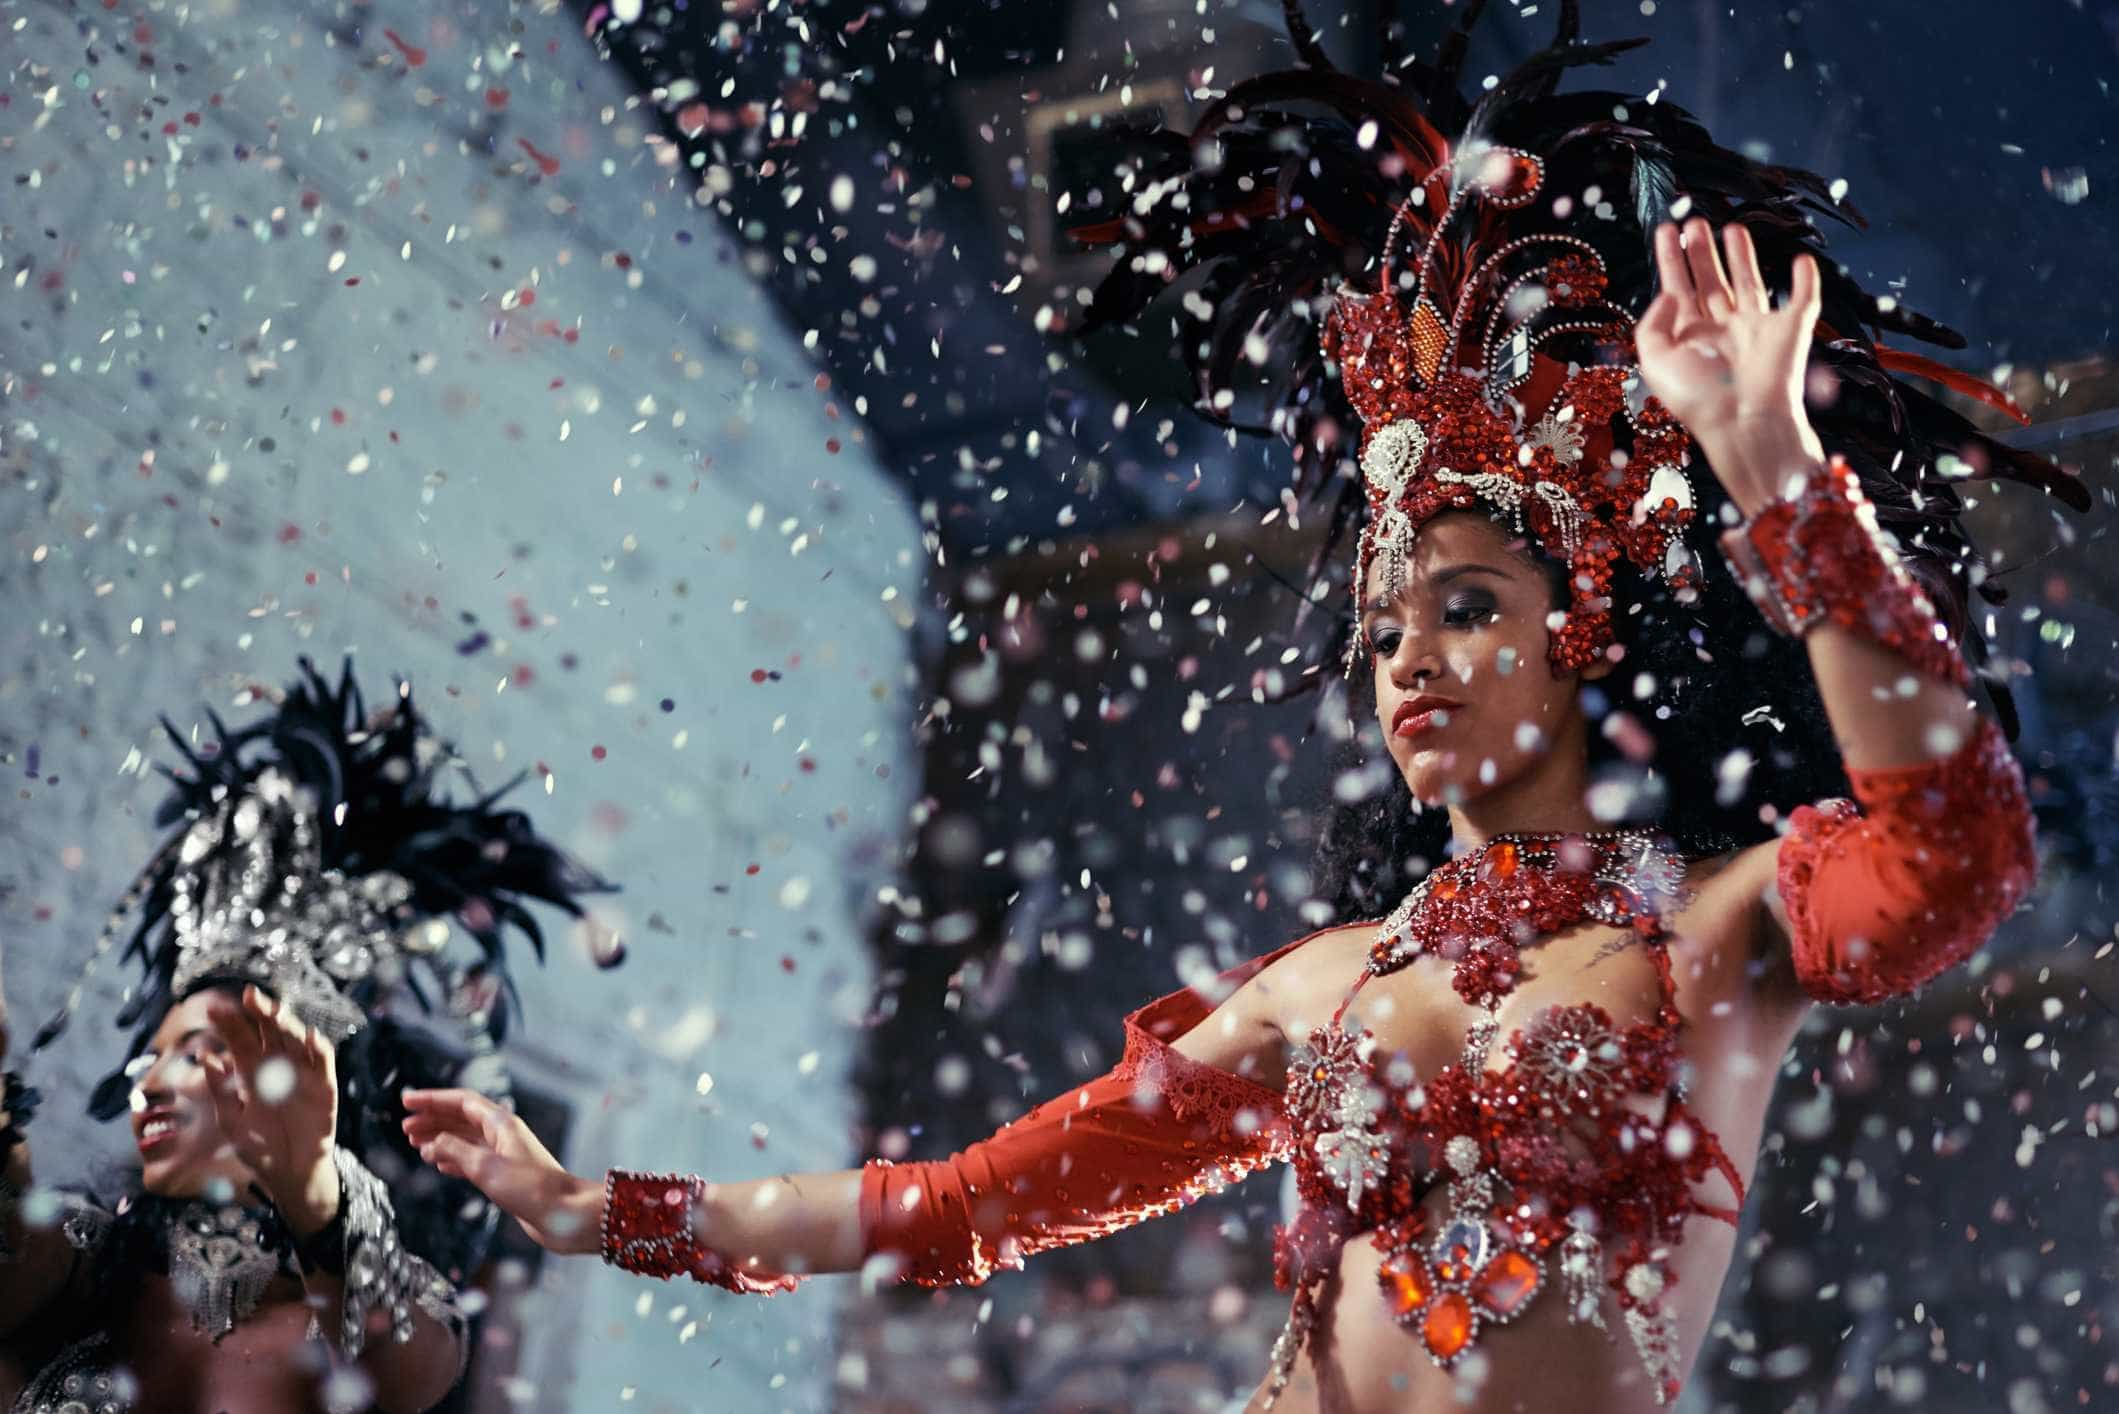 Vamos sambar em Lisboa? O Festival 'Viva o Samba' vai colorir a capital